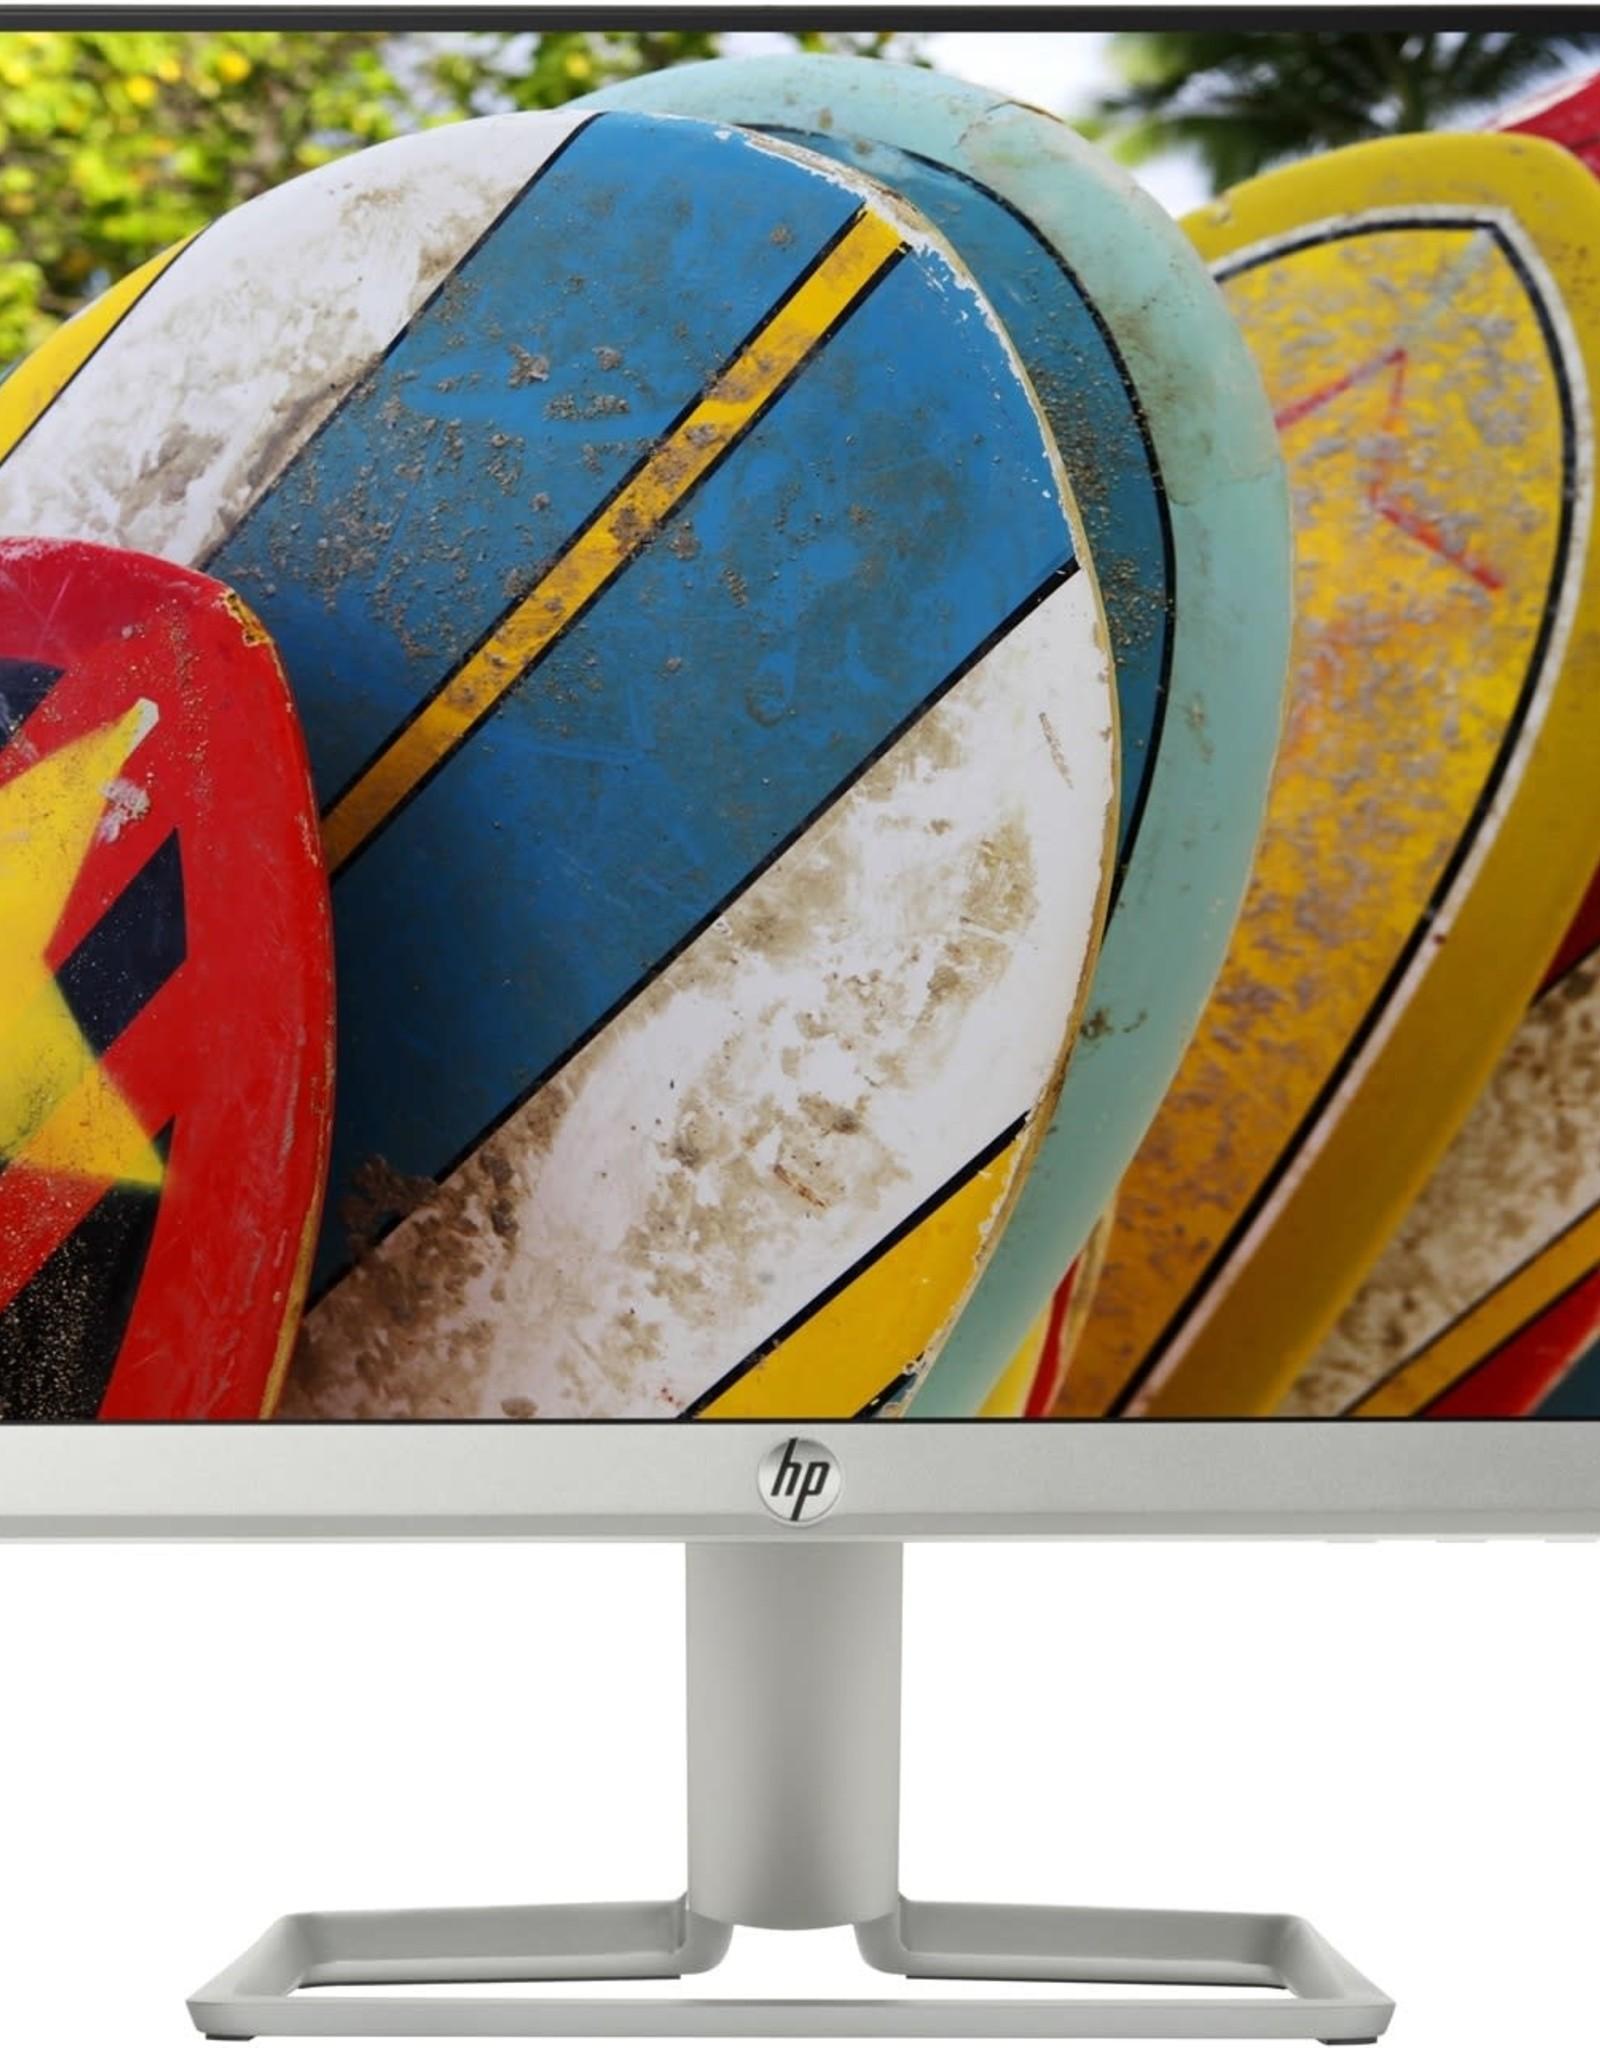 HP HP 22FW Display 21.5-inch LED 3KS60AA#ABA